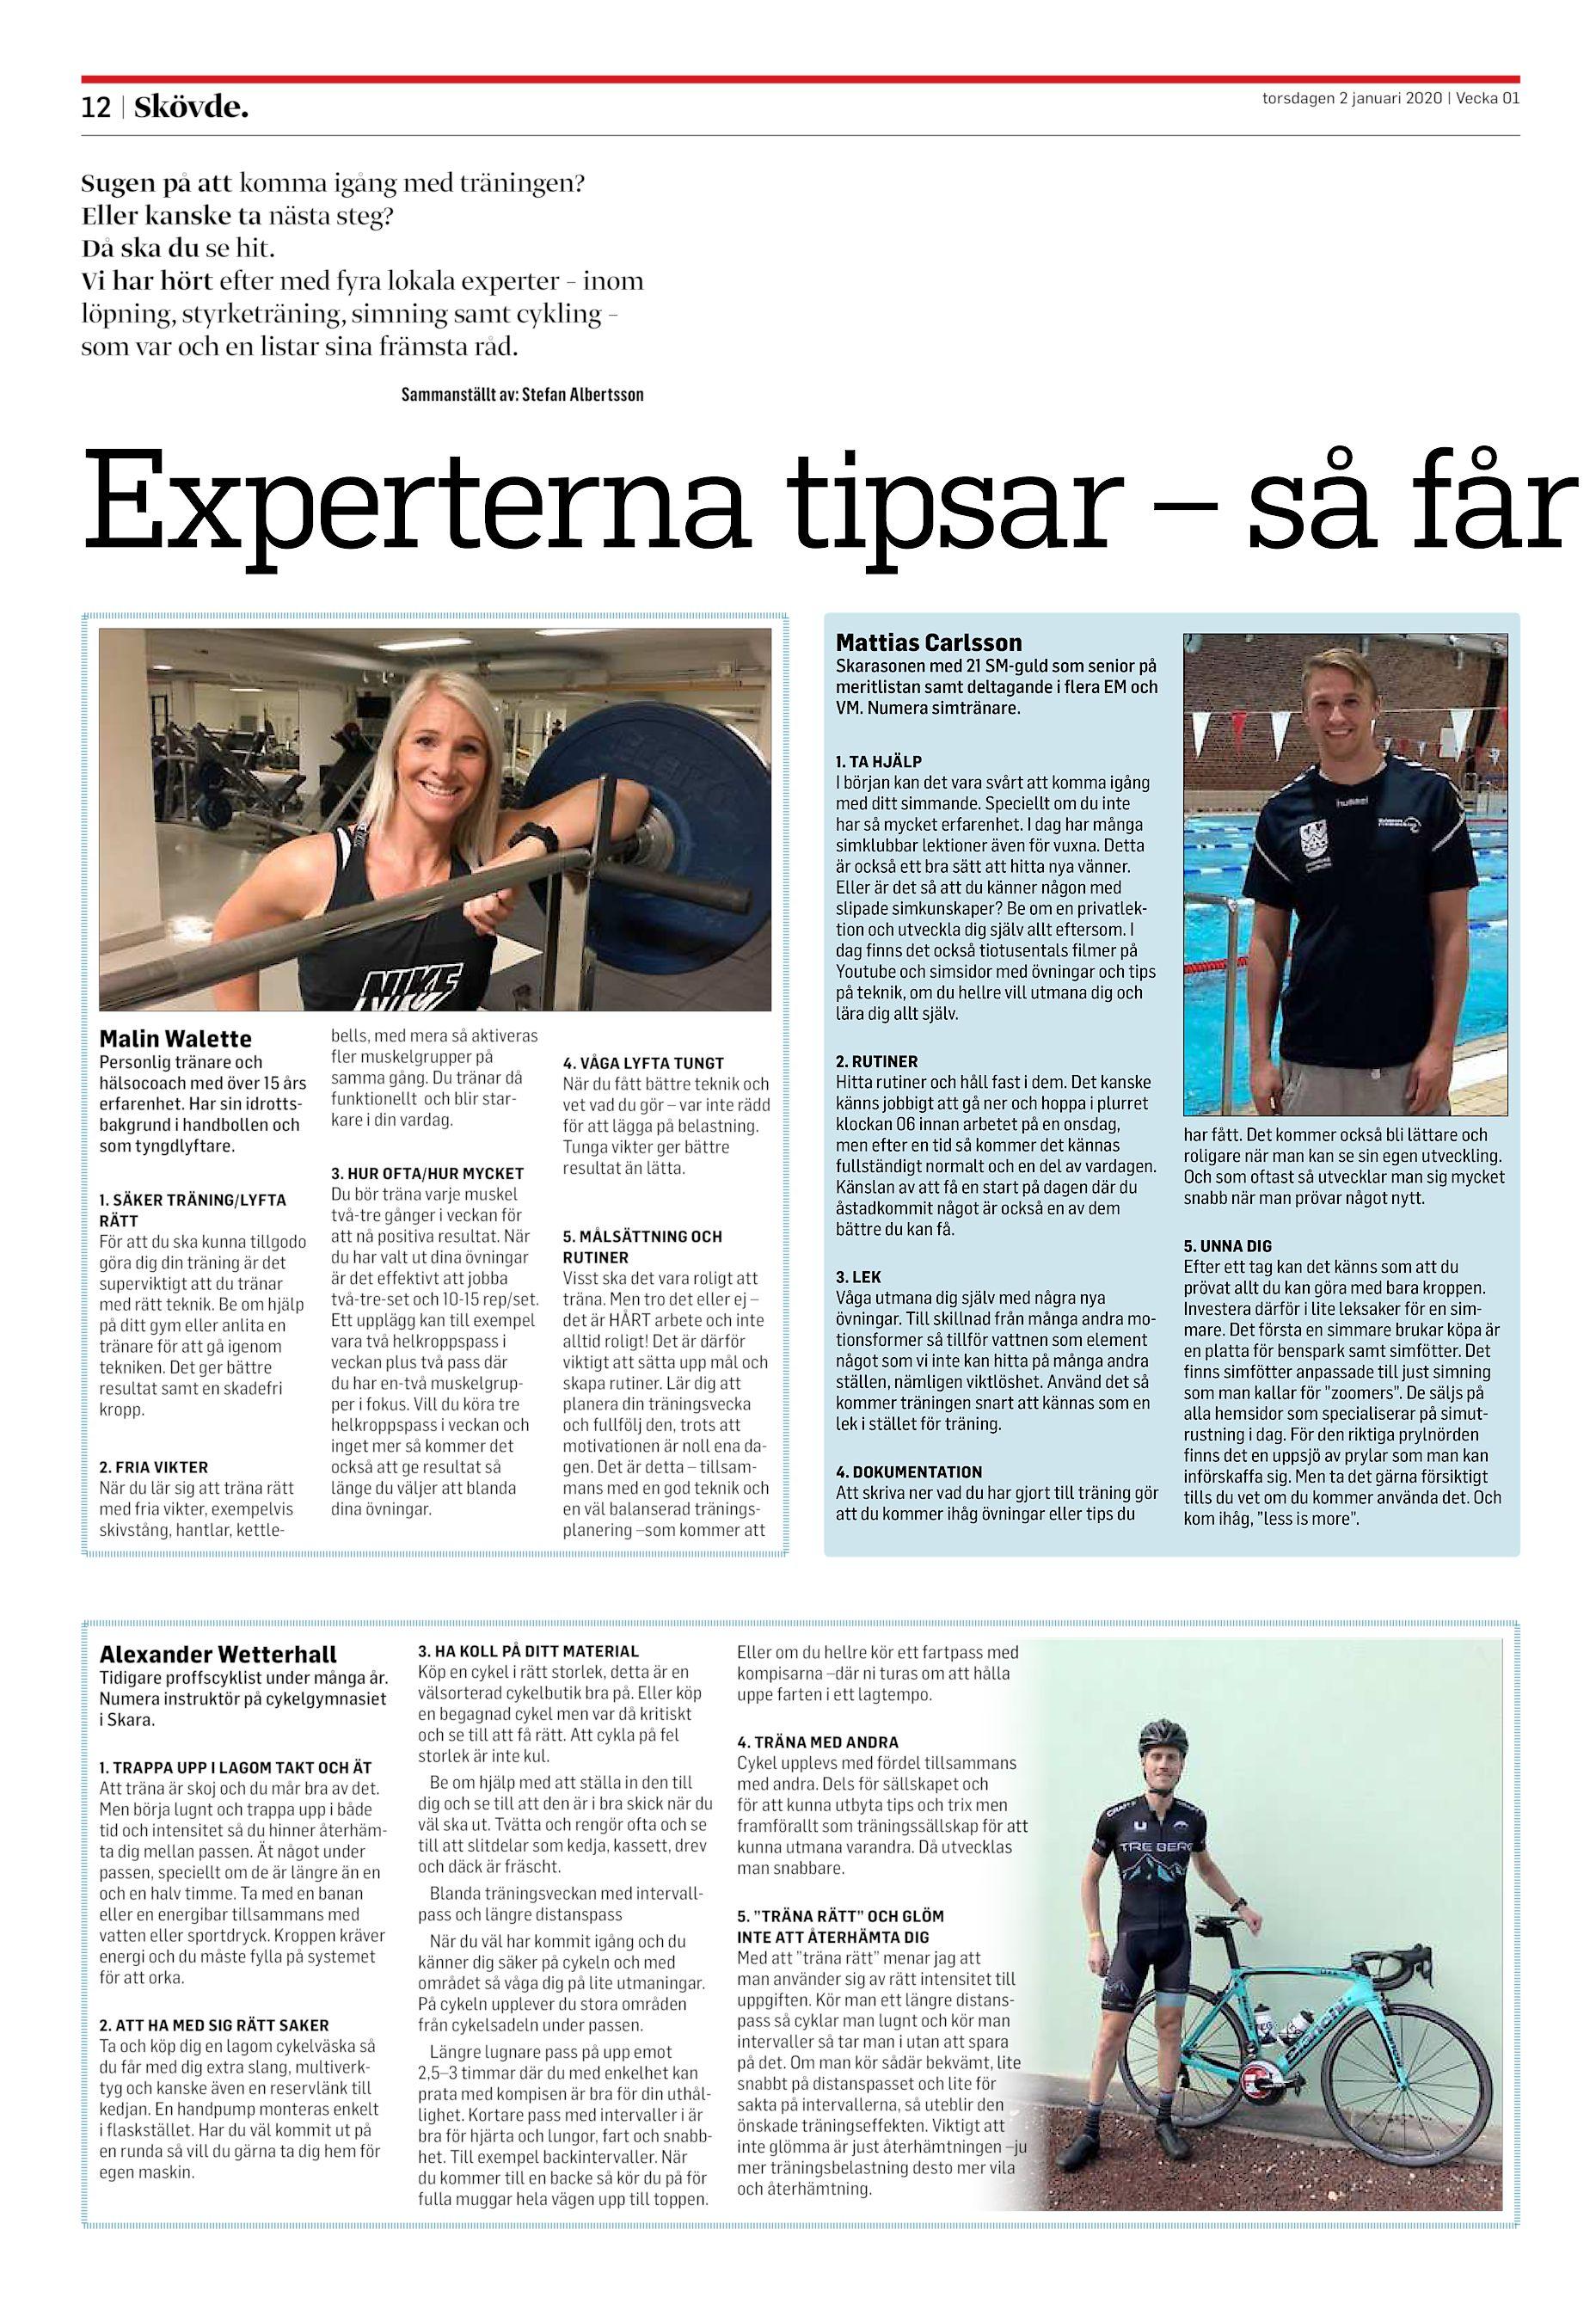 Skaven 206 Vstra Gtalands Ln, Nygrd - satisfaction-survey.net